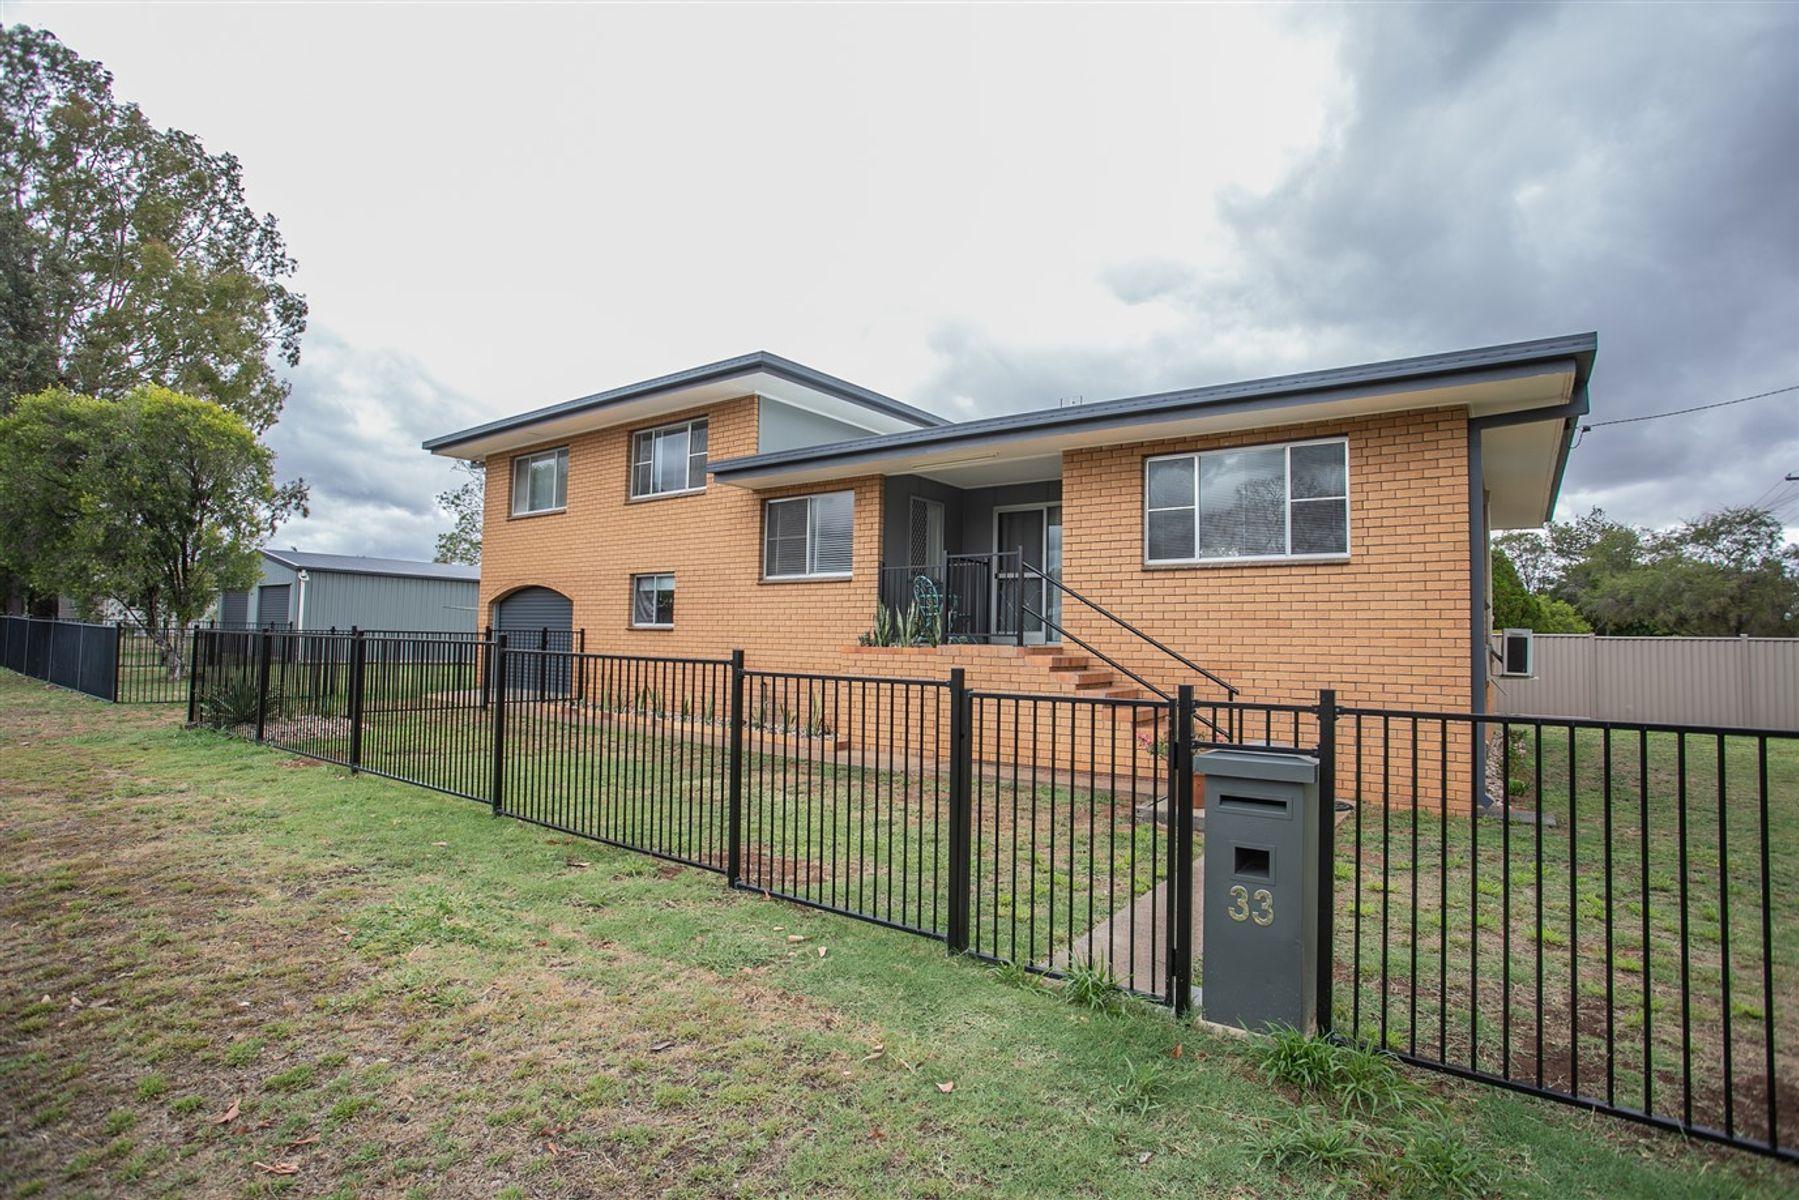 33 Claydon Street, Chinchilla, QLD 4413